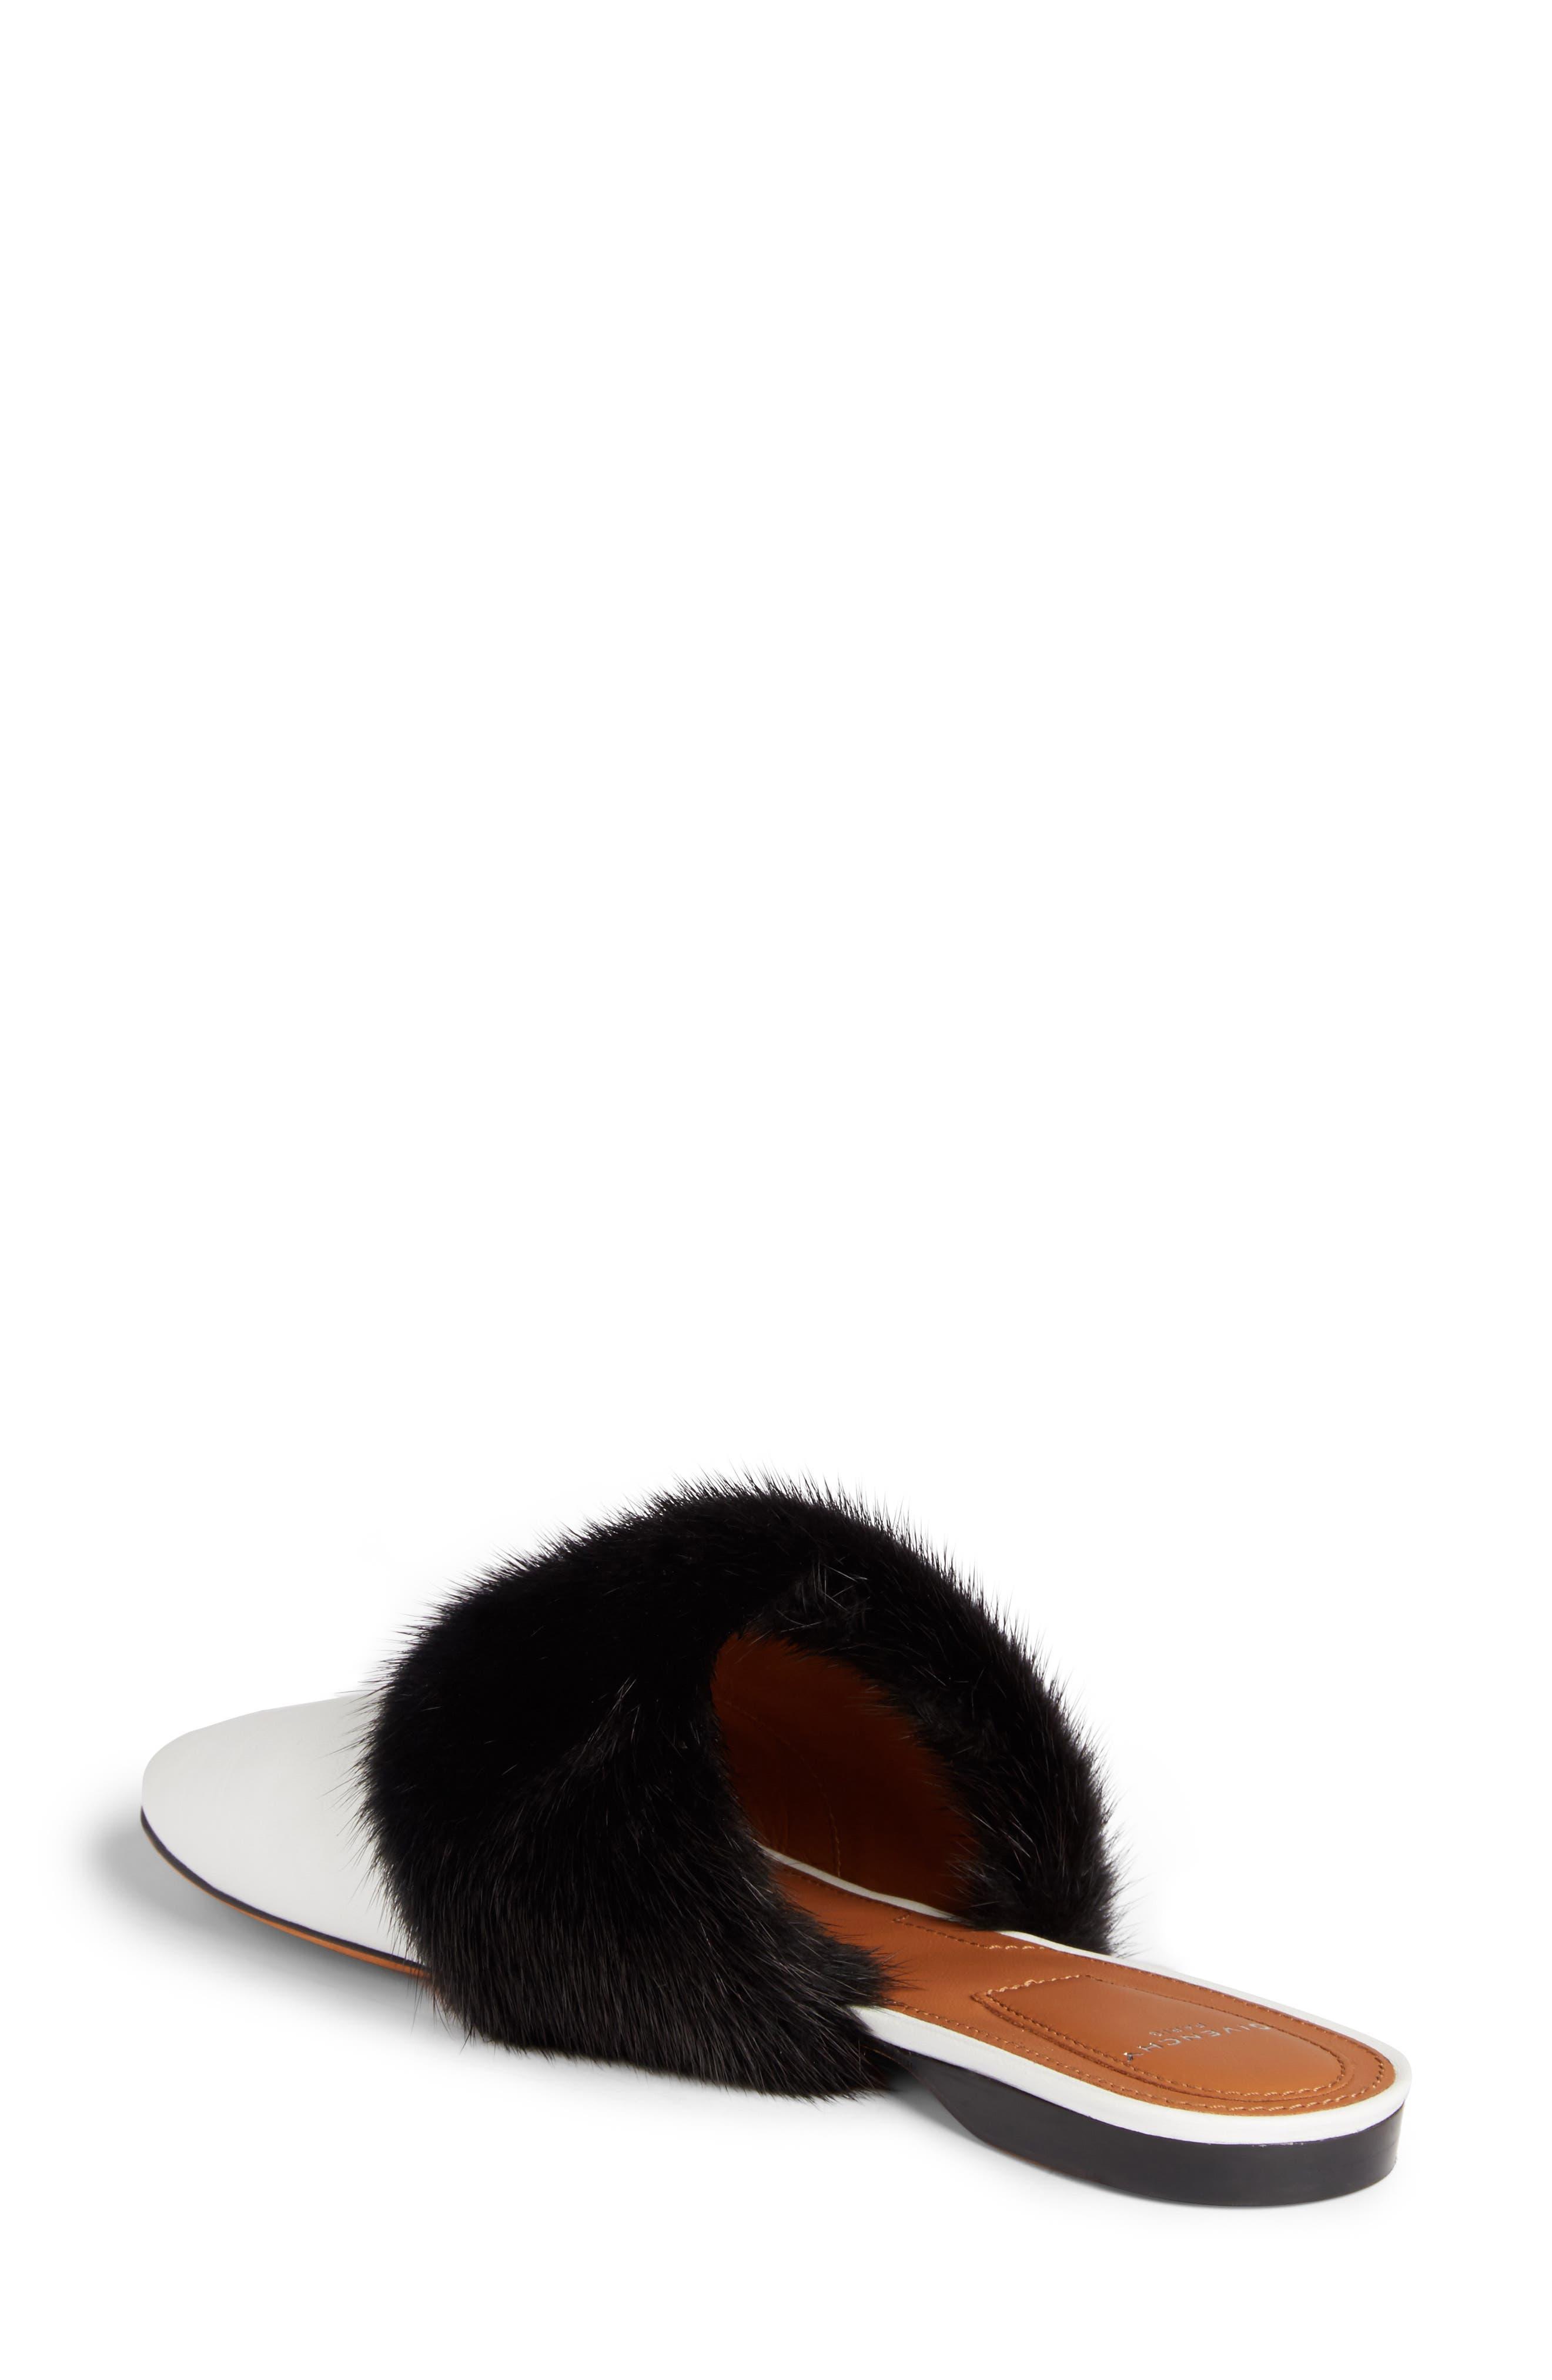 Genuine Mink Fur Mule,                             Alternate thumbnail 2, color,                             White/ Black